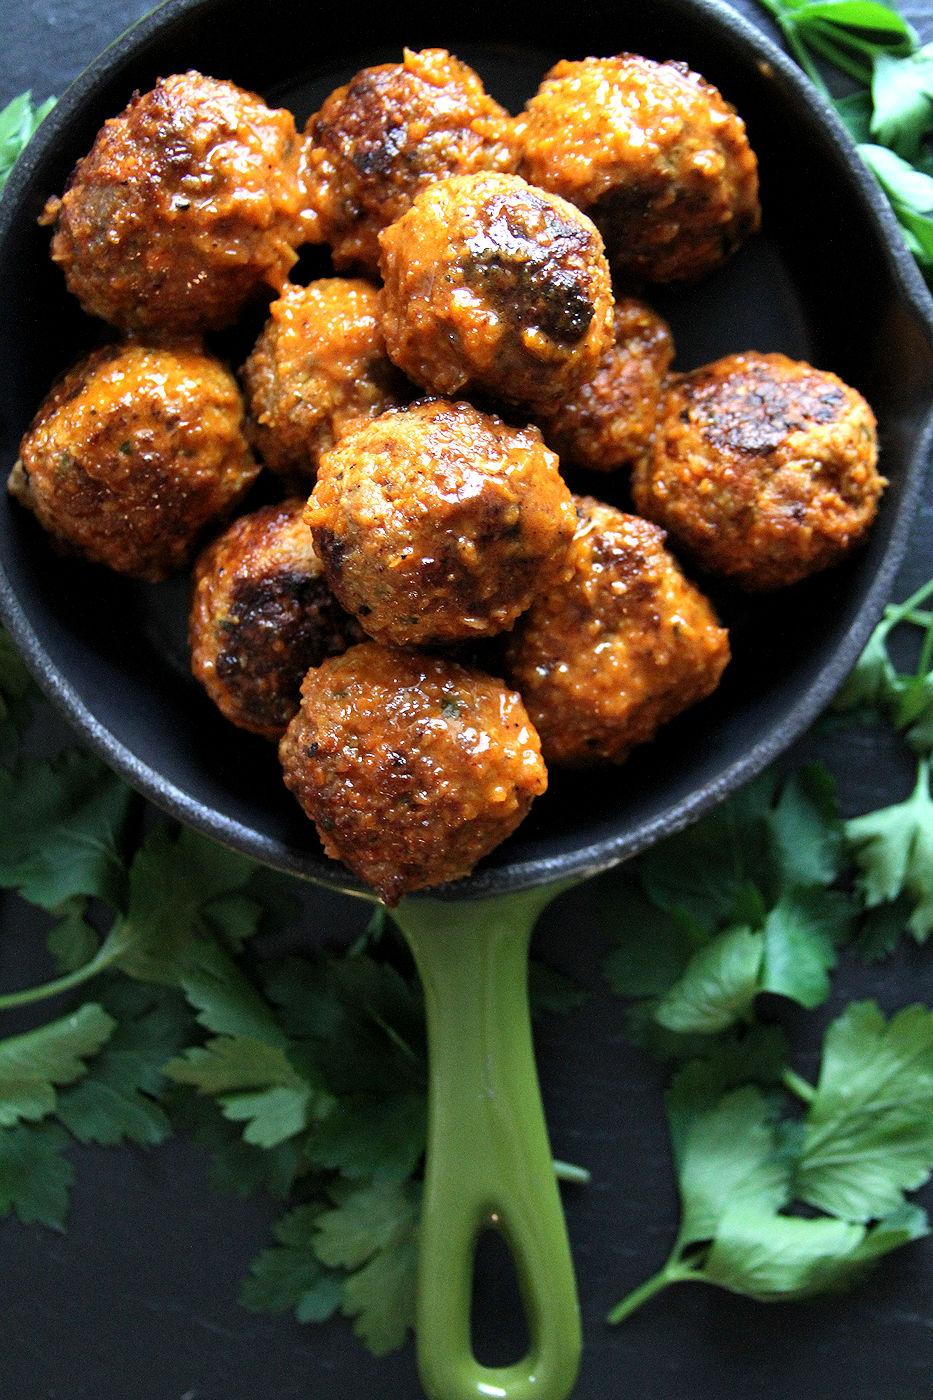 Morrocan-SpicedTurkeyMeatballs-medium2